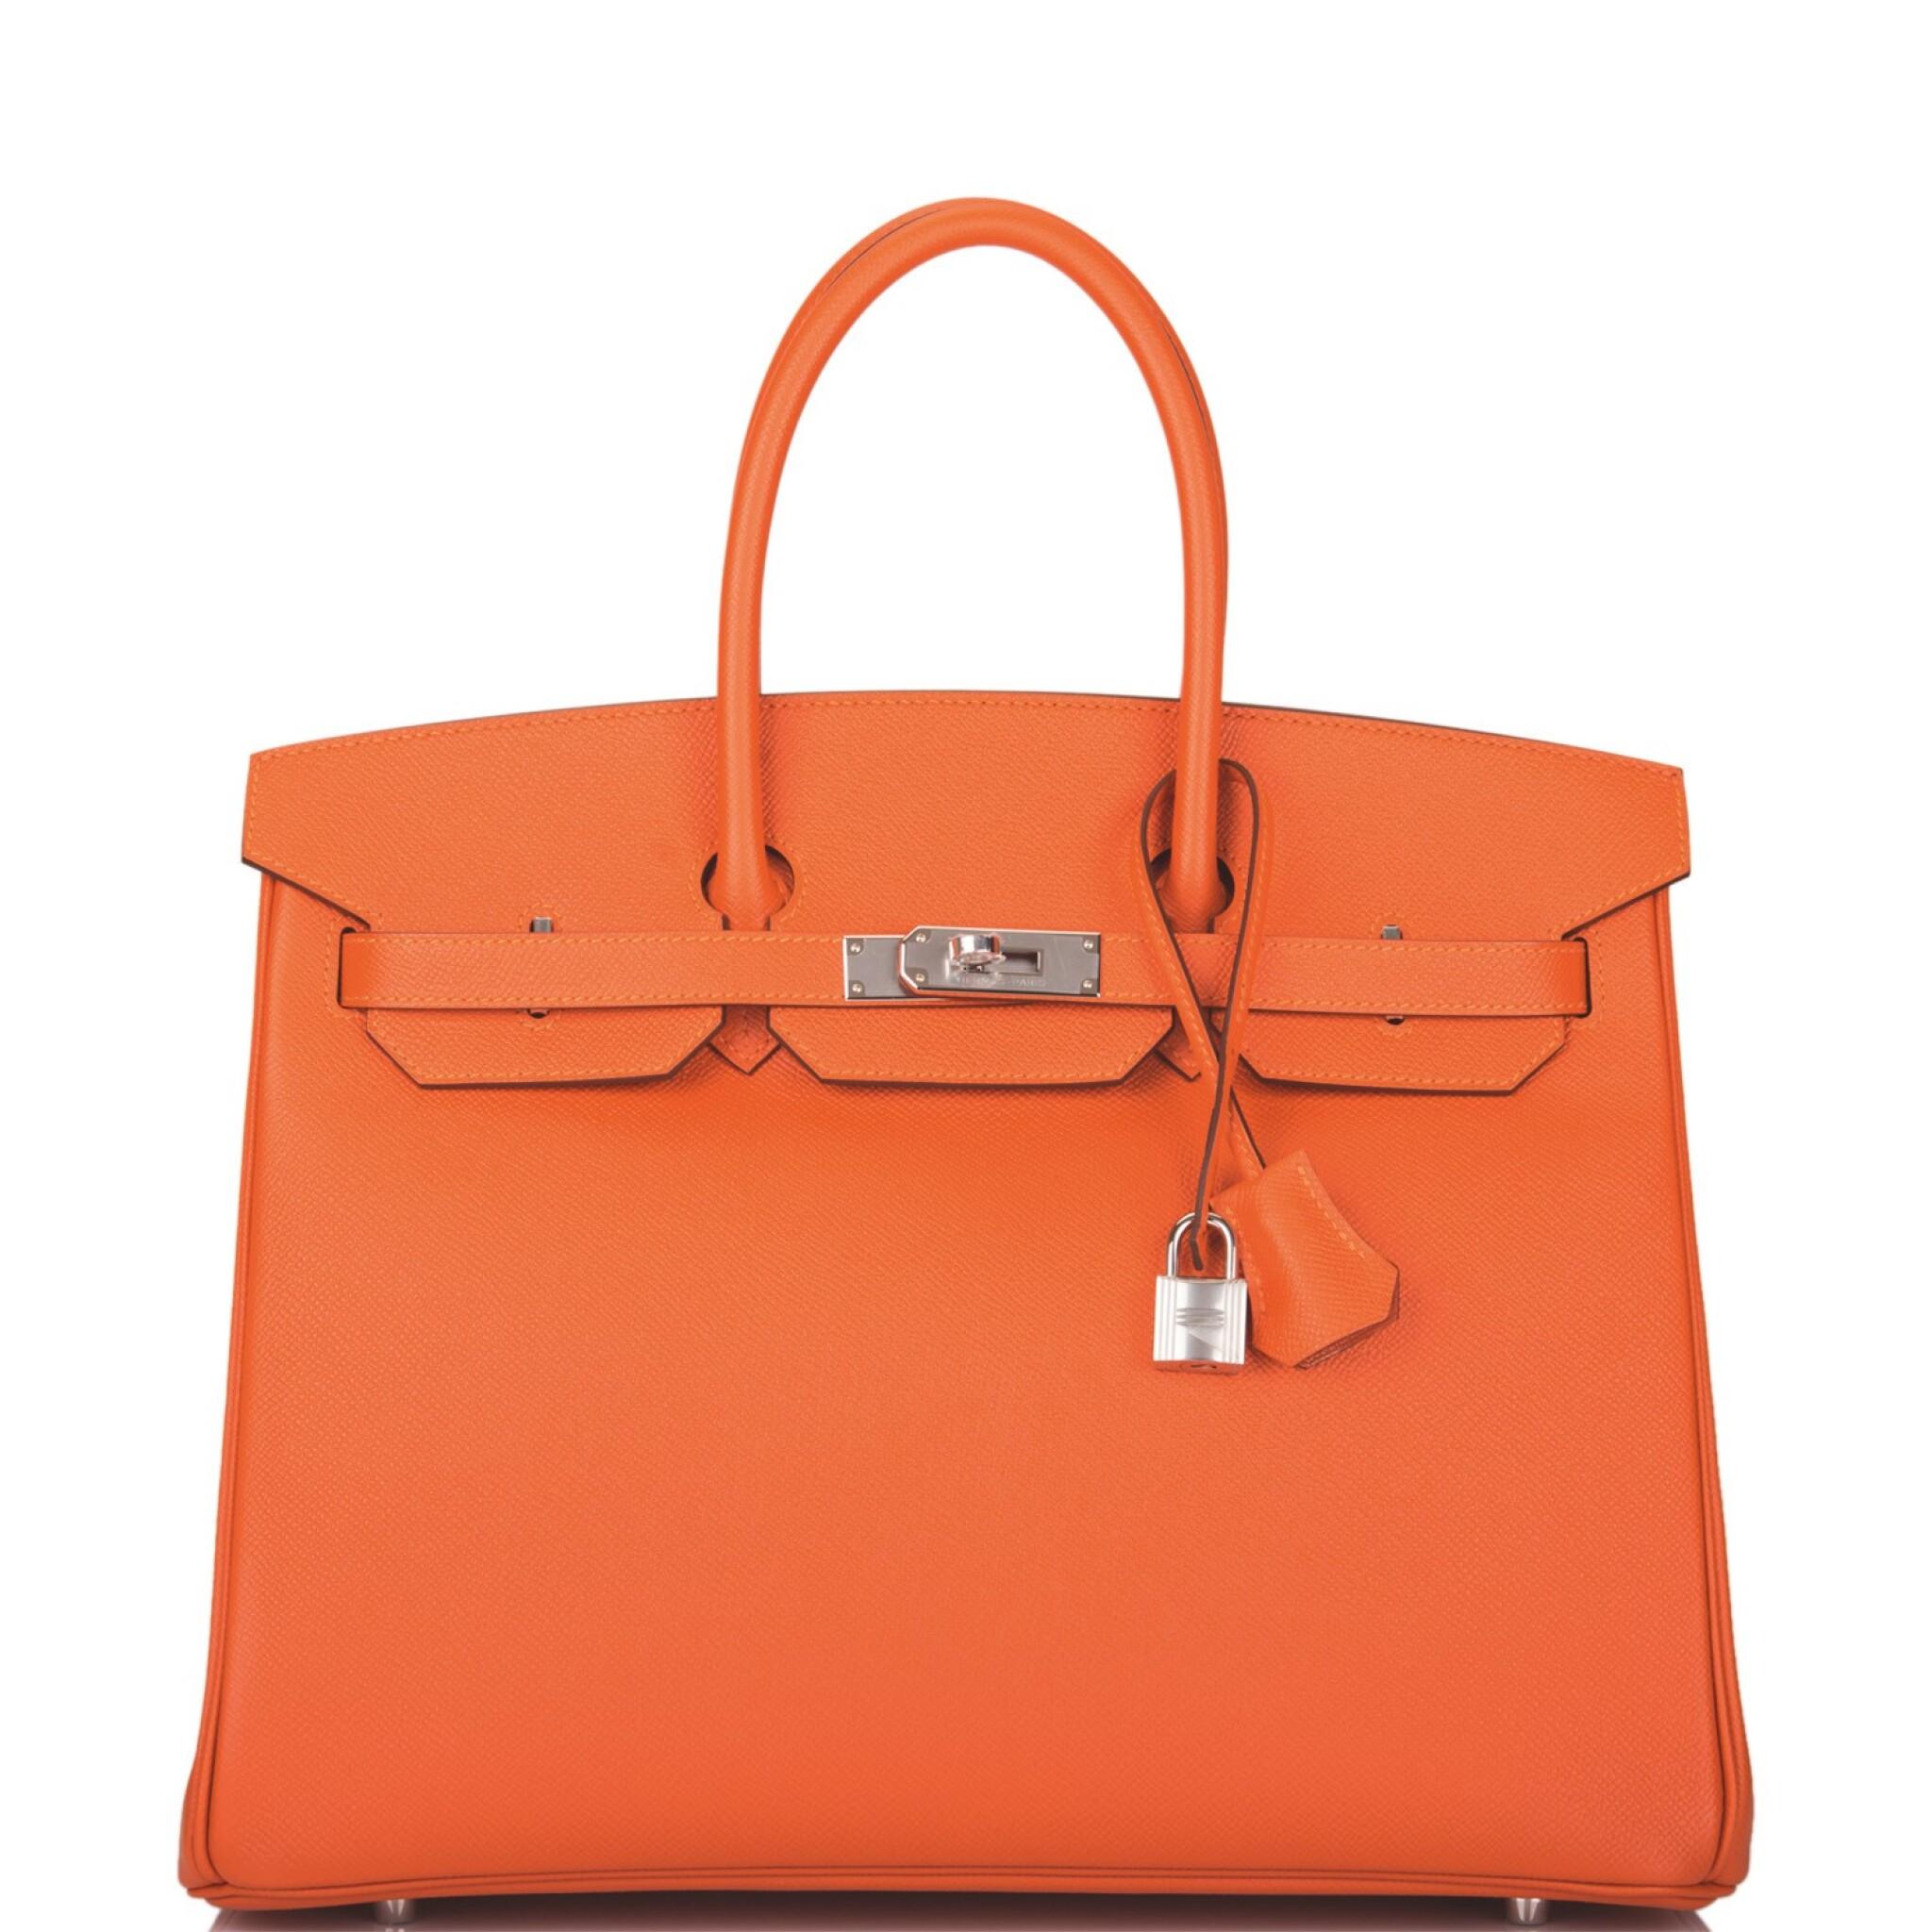 View full screen - View 1 of Lot 65. Hermès Feu Birkin 35cm of Epsom Leather with Palladium Hardware .